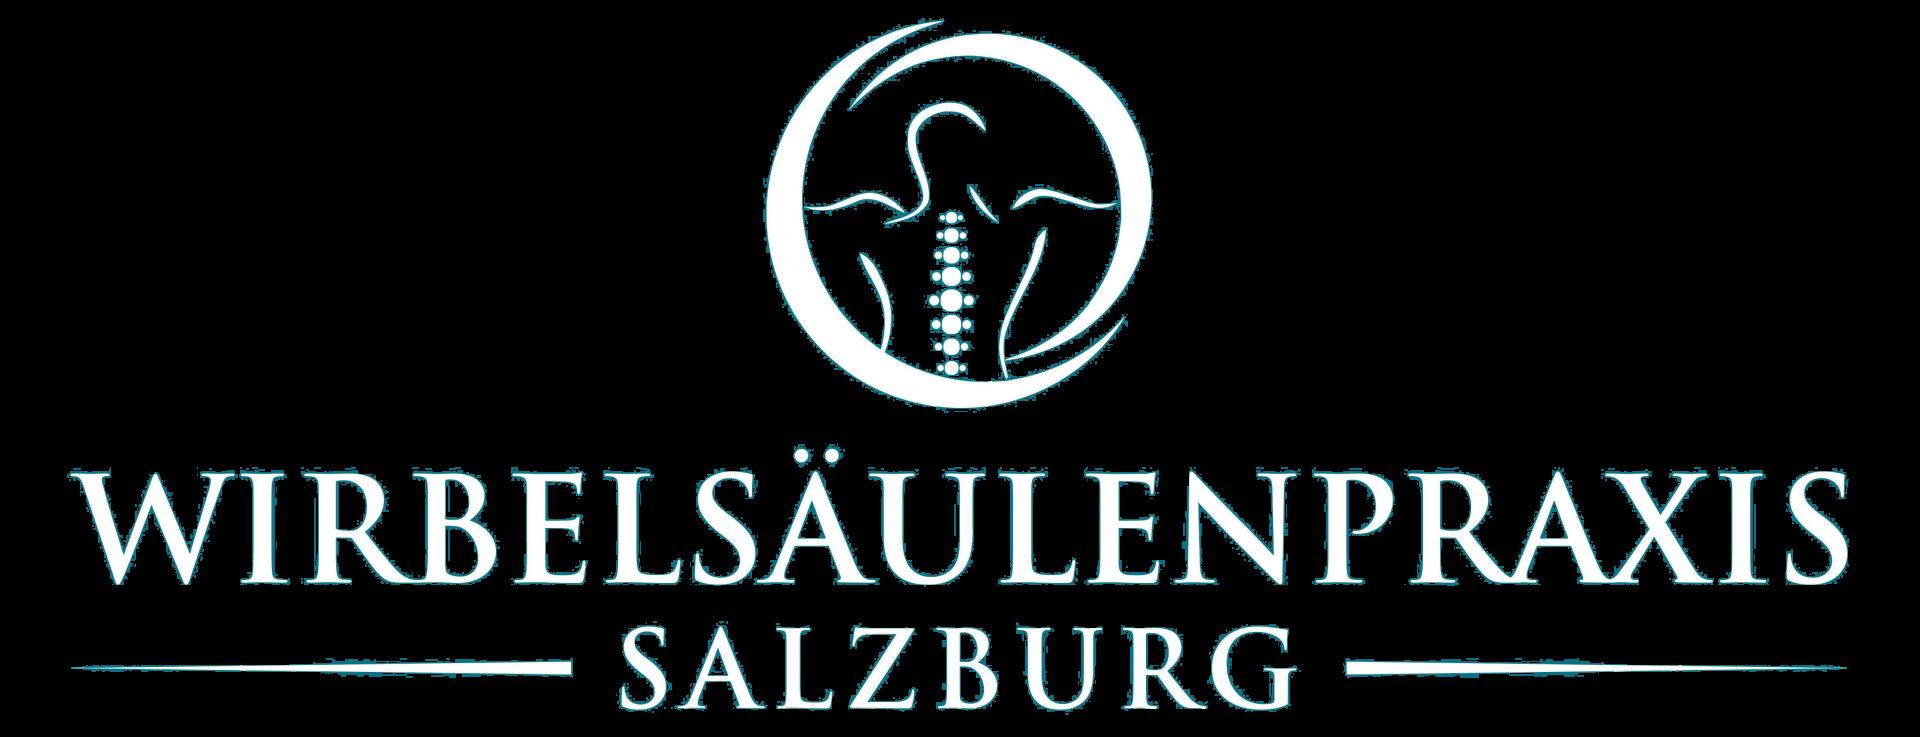 Wirbelsäulenpraxis Salzburg Logo